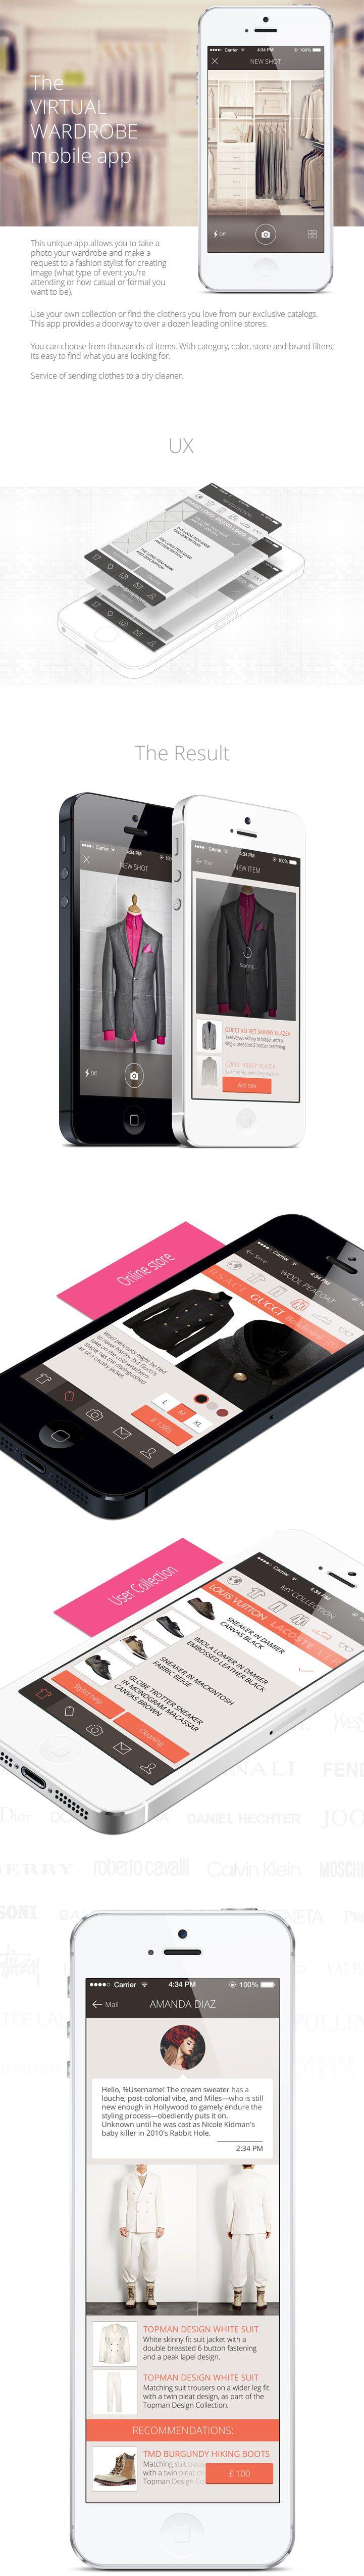 The Virtual Wardrobe mobile app